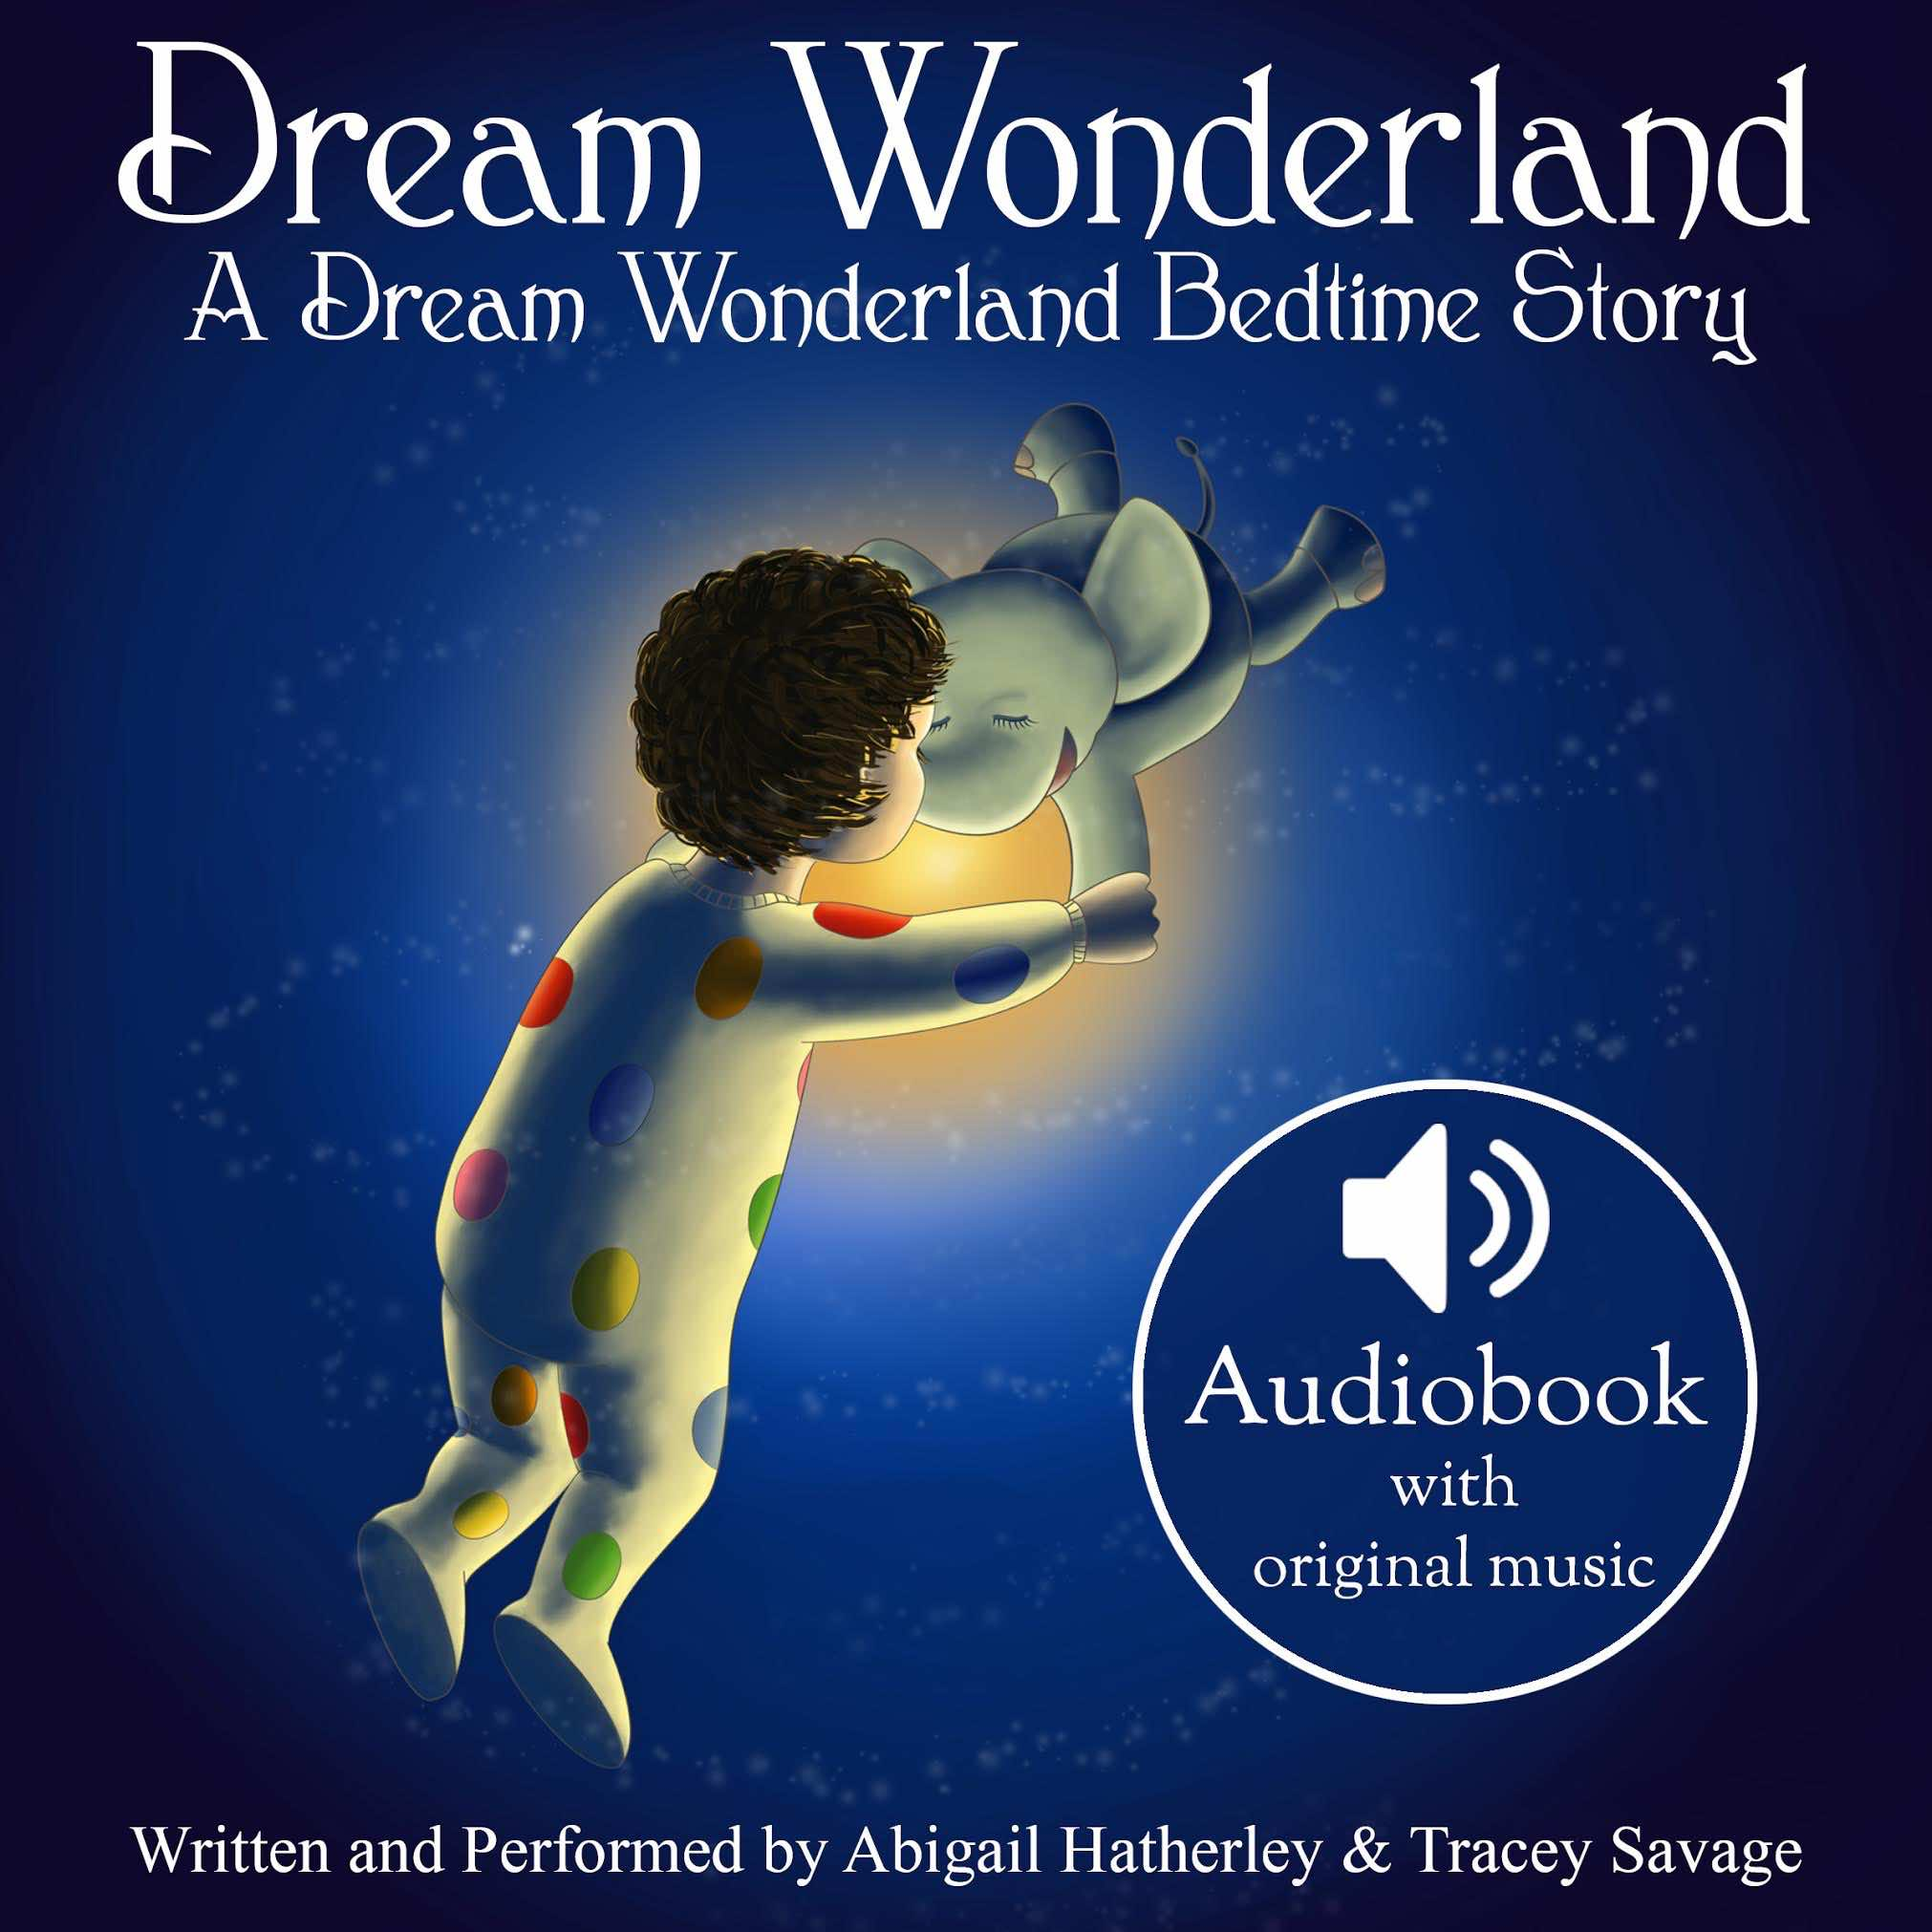 Dream Wonderland on Little Rockers Radio